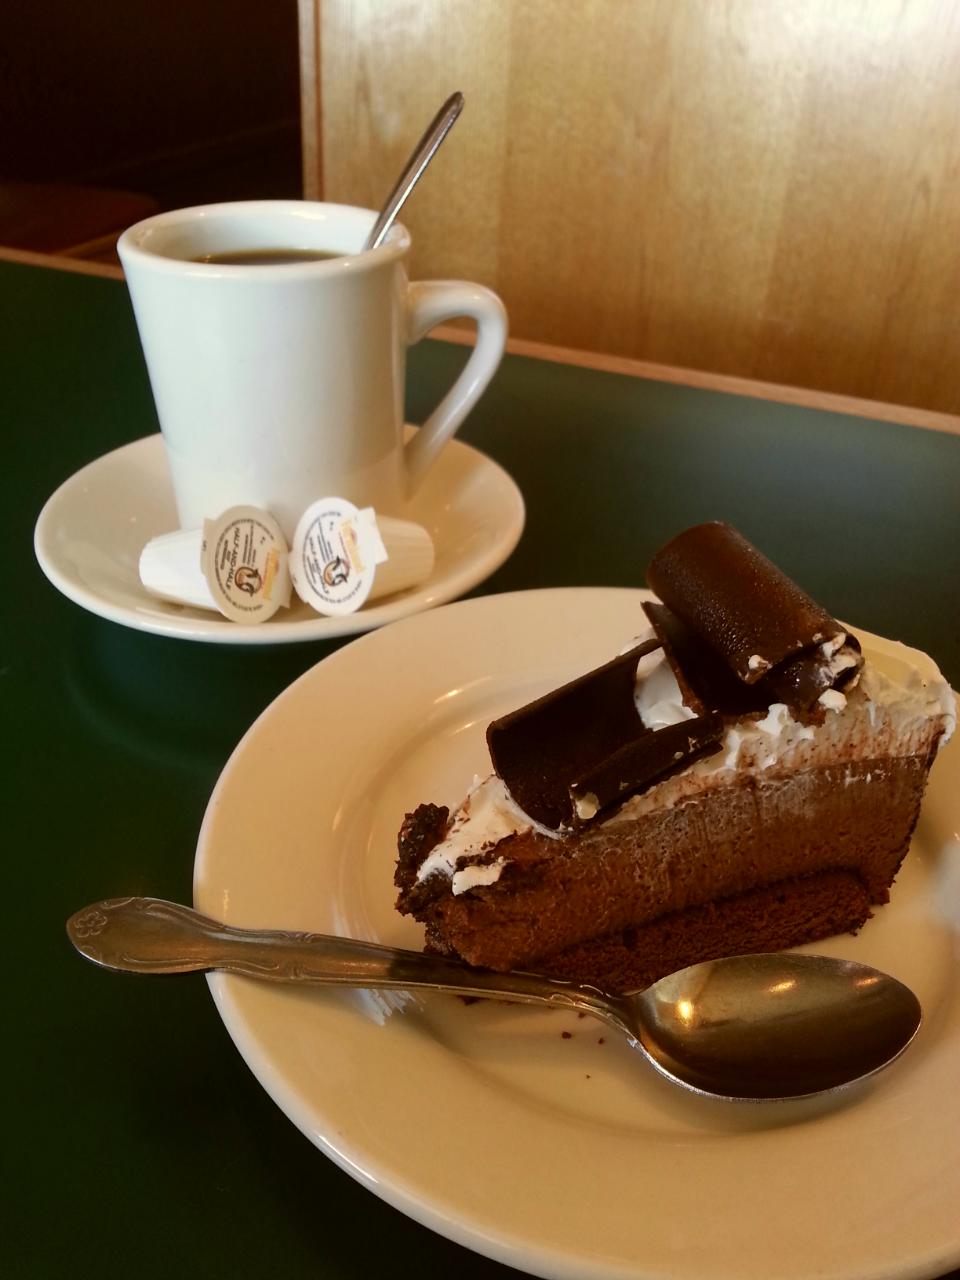 Copy of Copy of Copy of Copy of Chocolate Mousse Cake and Coffee!